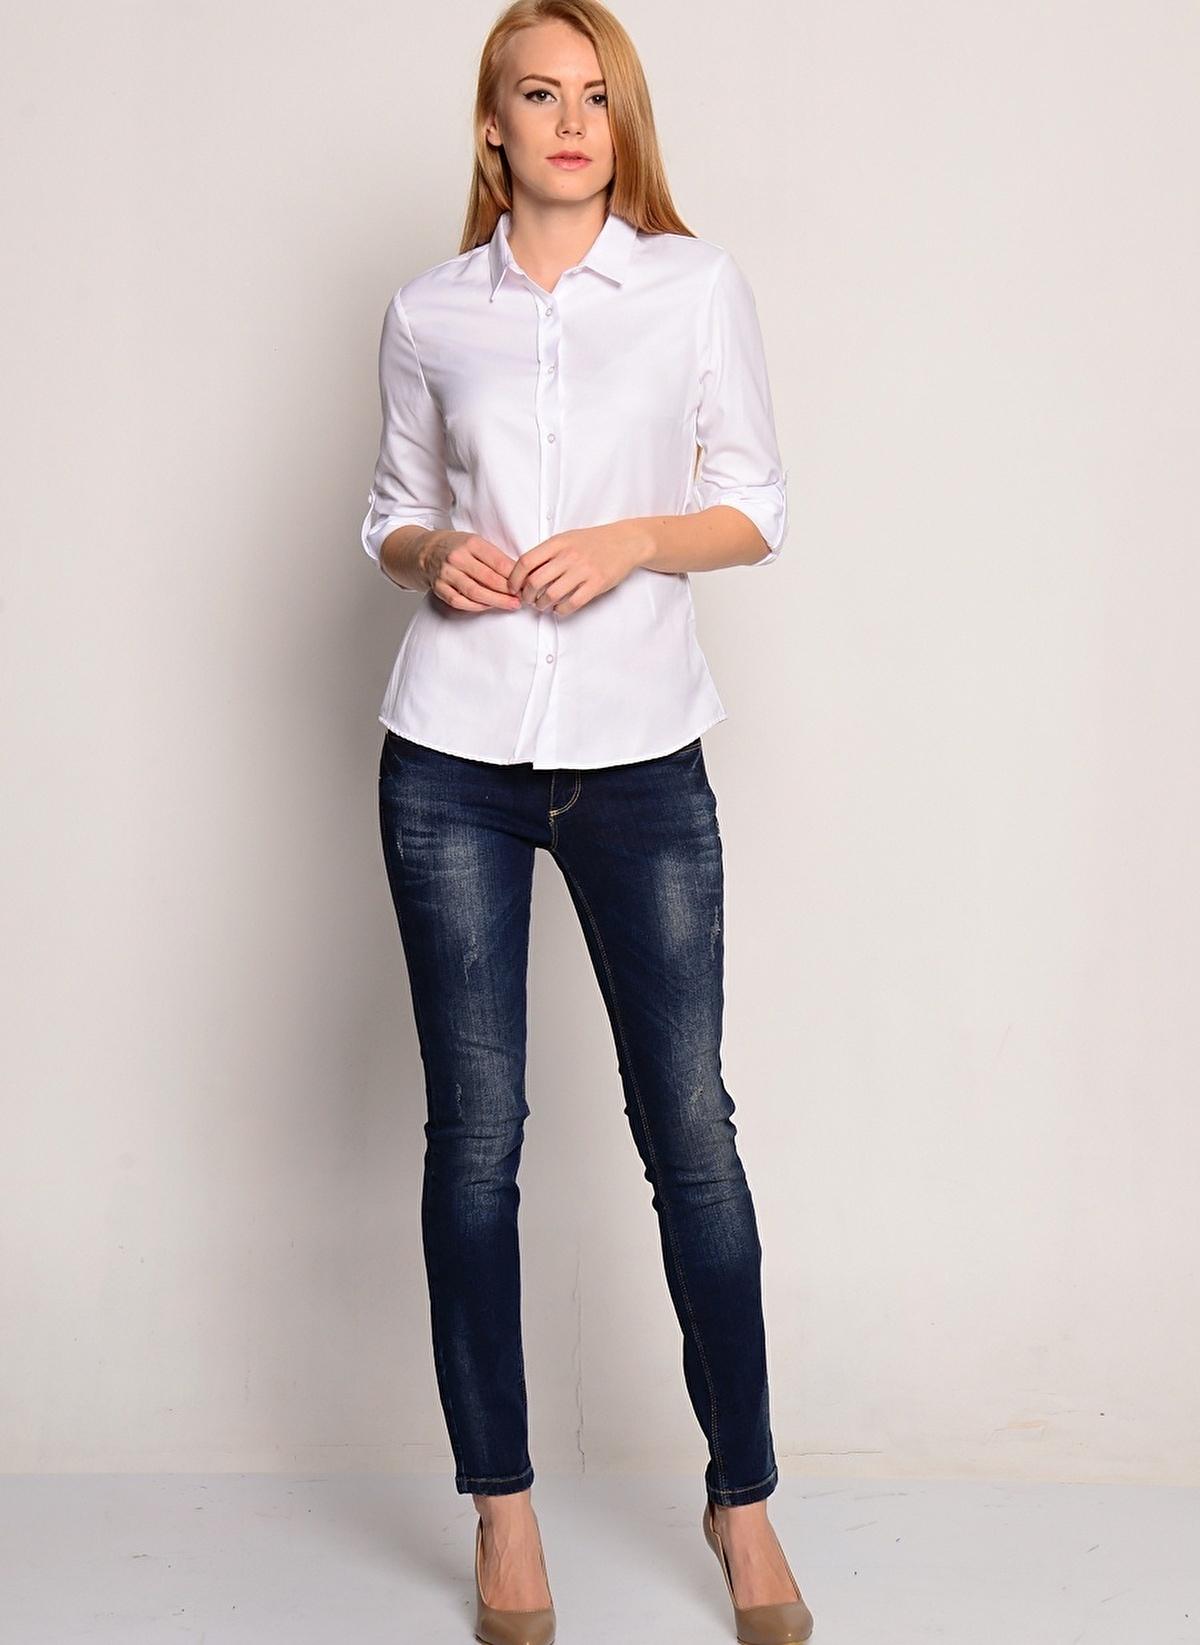 Fresh Company Pantolon 52den Jany Crs Pantolon – 34.99 TL